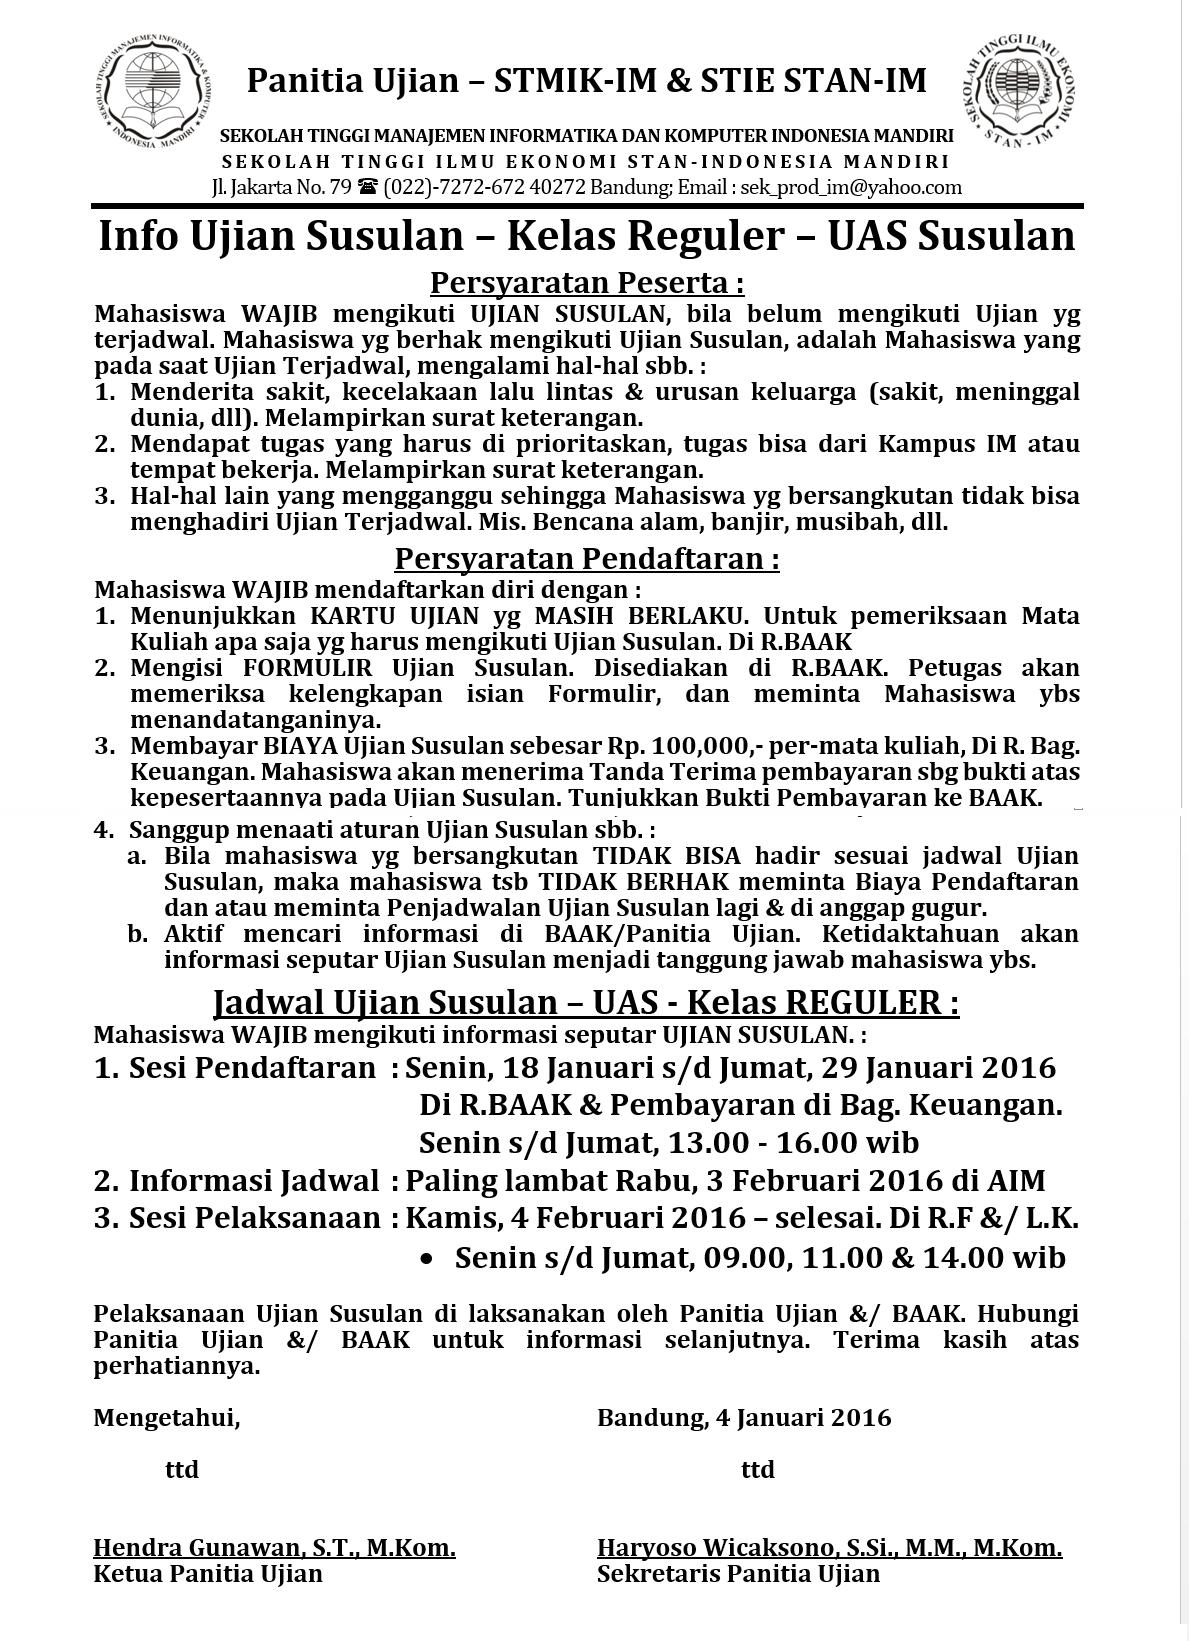 Info USUS REG